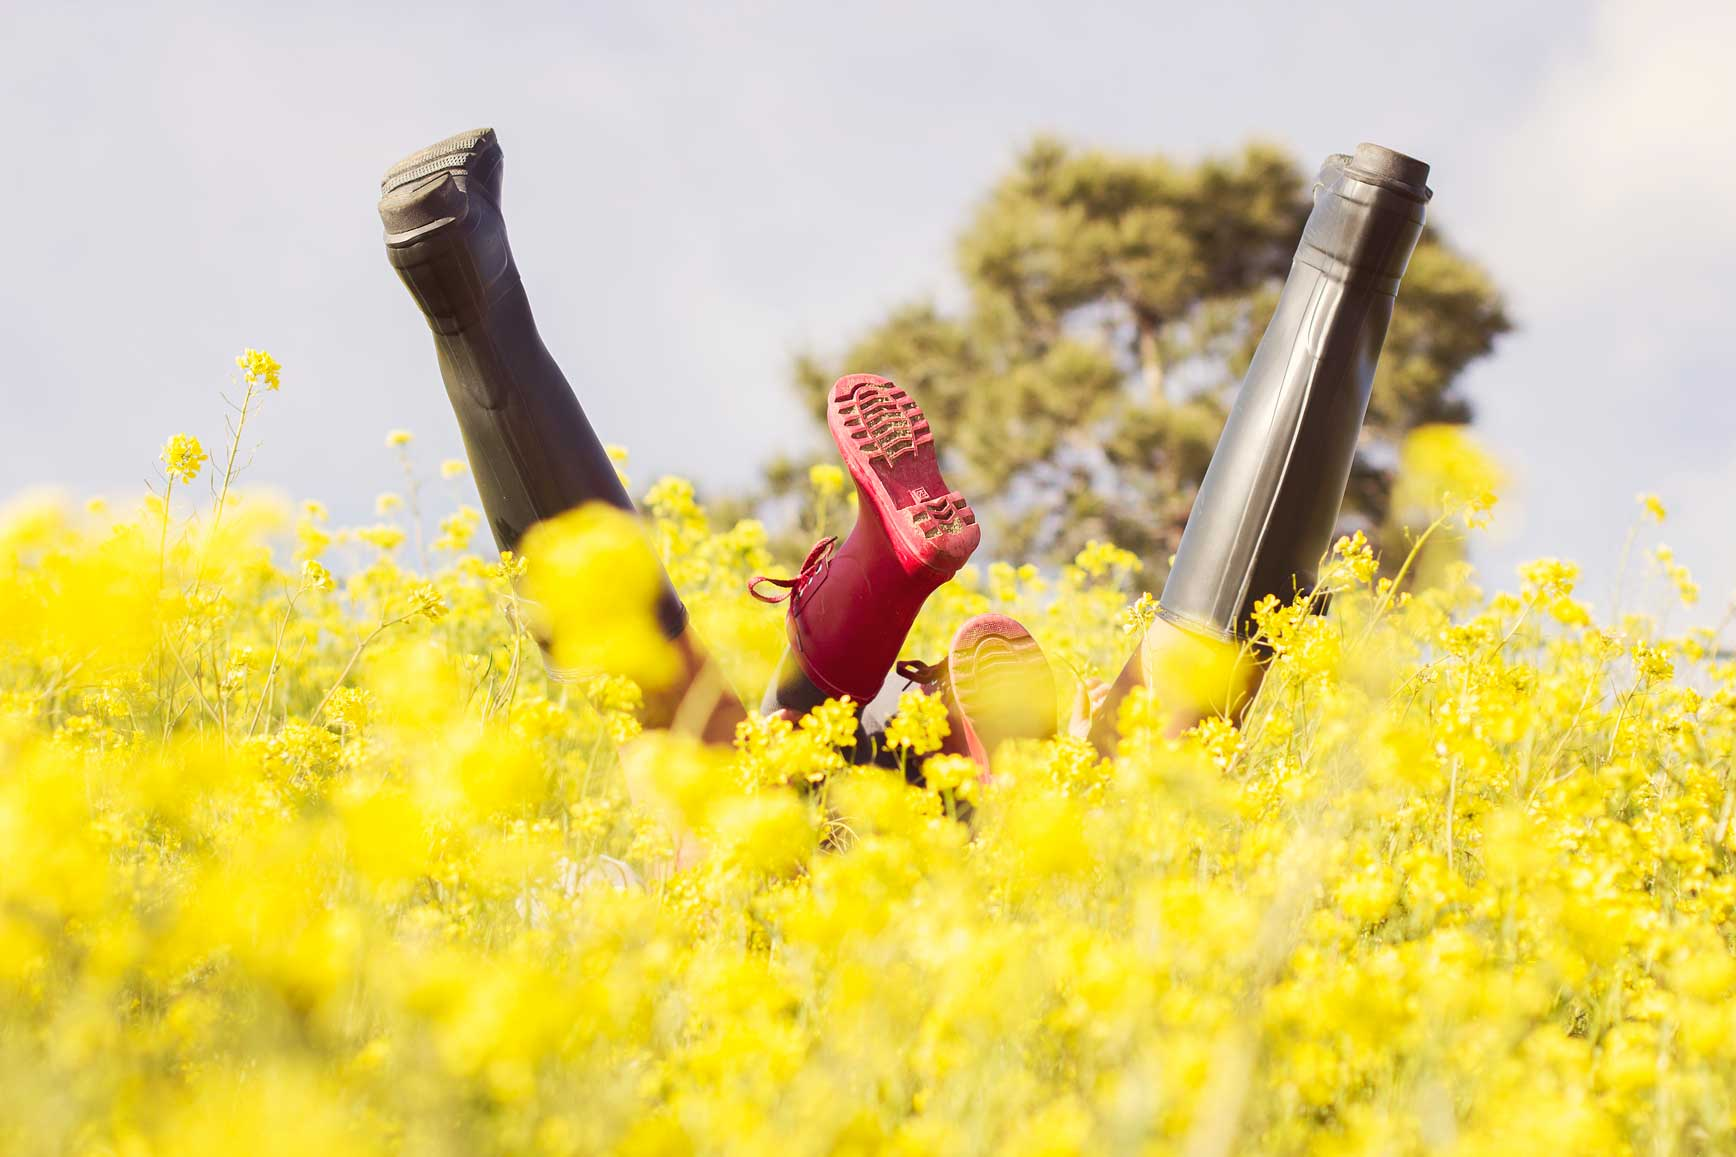 Campos-de-flores-amarillas-claraBmartin-08